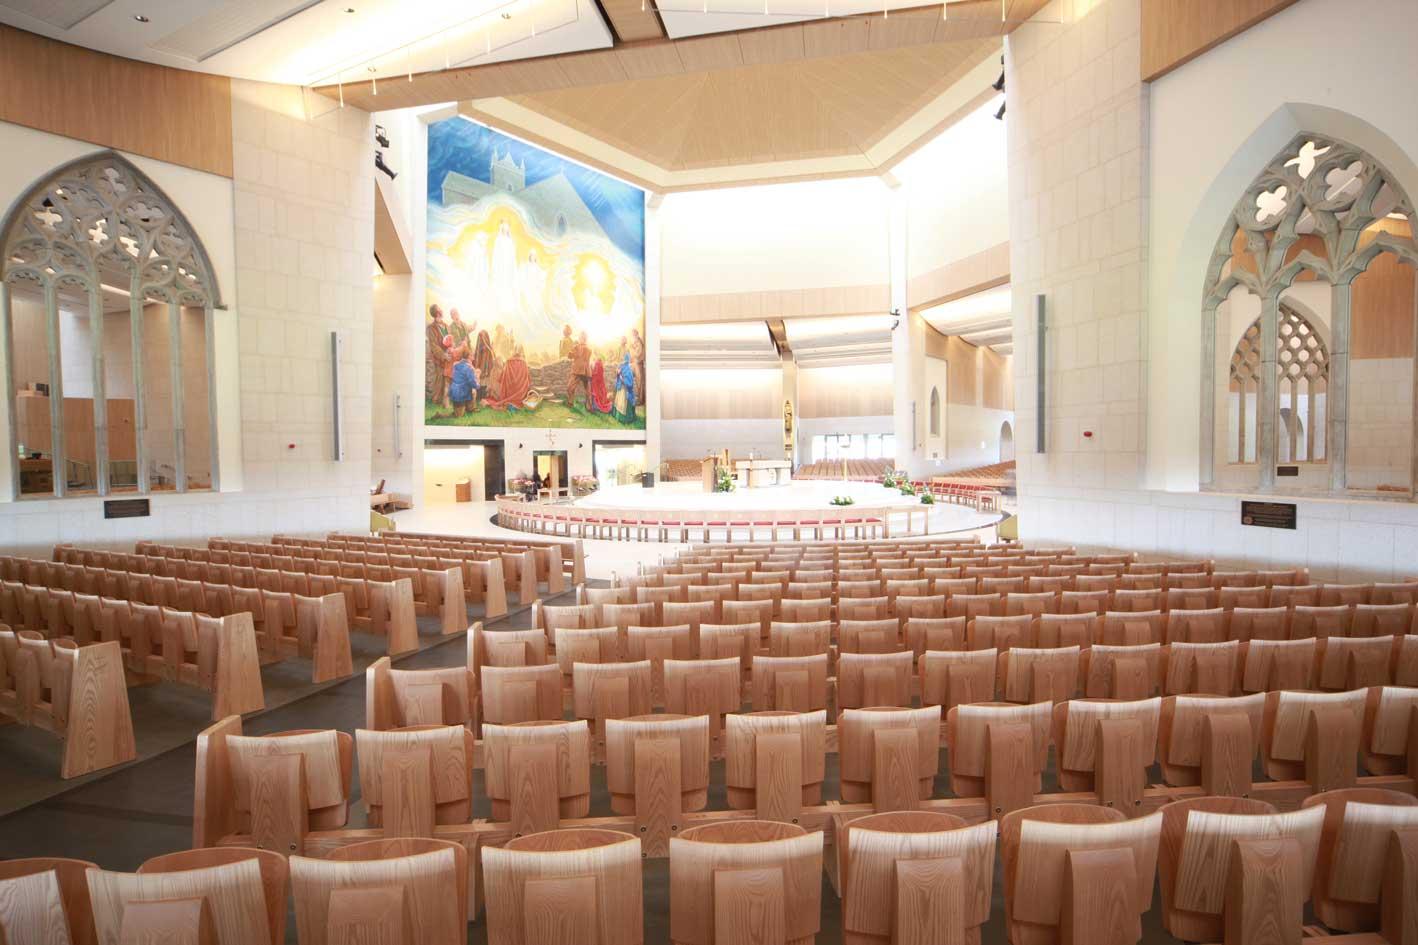 Knock Basilica auditorium flip seating innovative bespoke design (2)